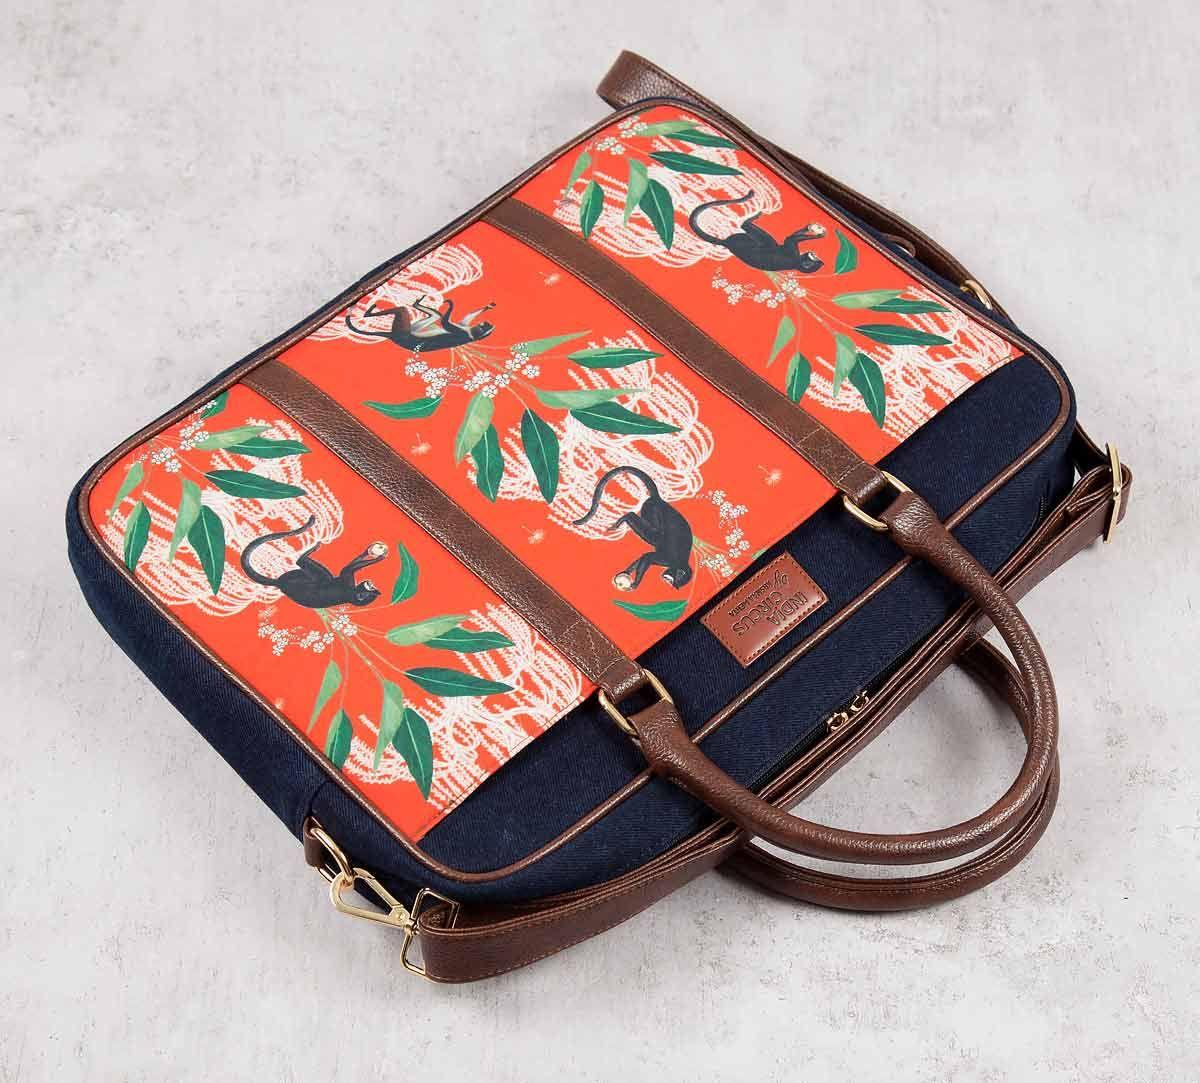 India Circus Monkey Games Laptop Bag